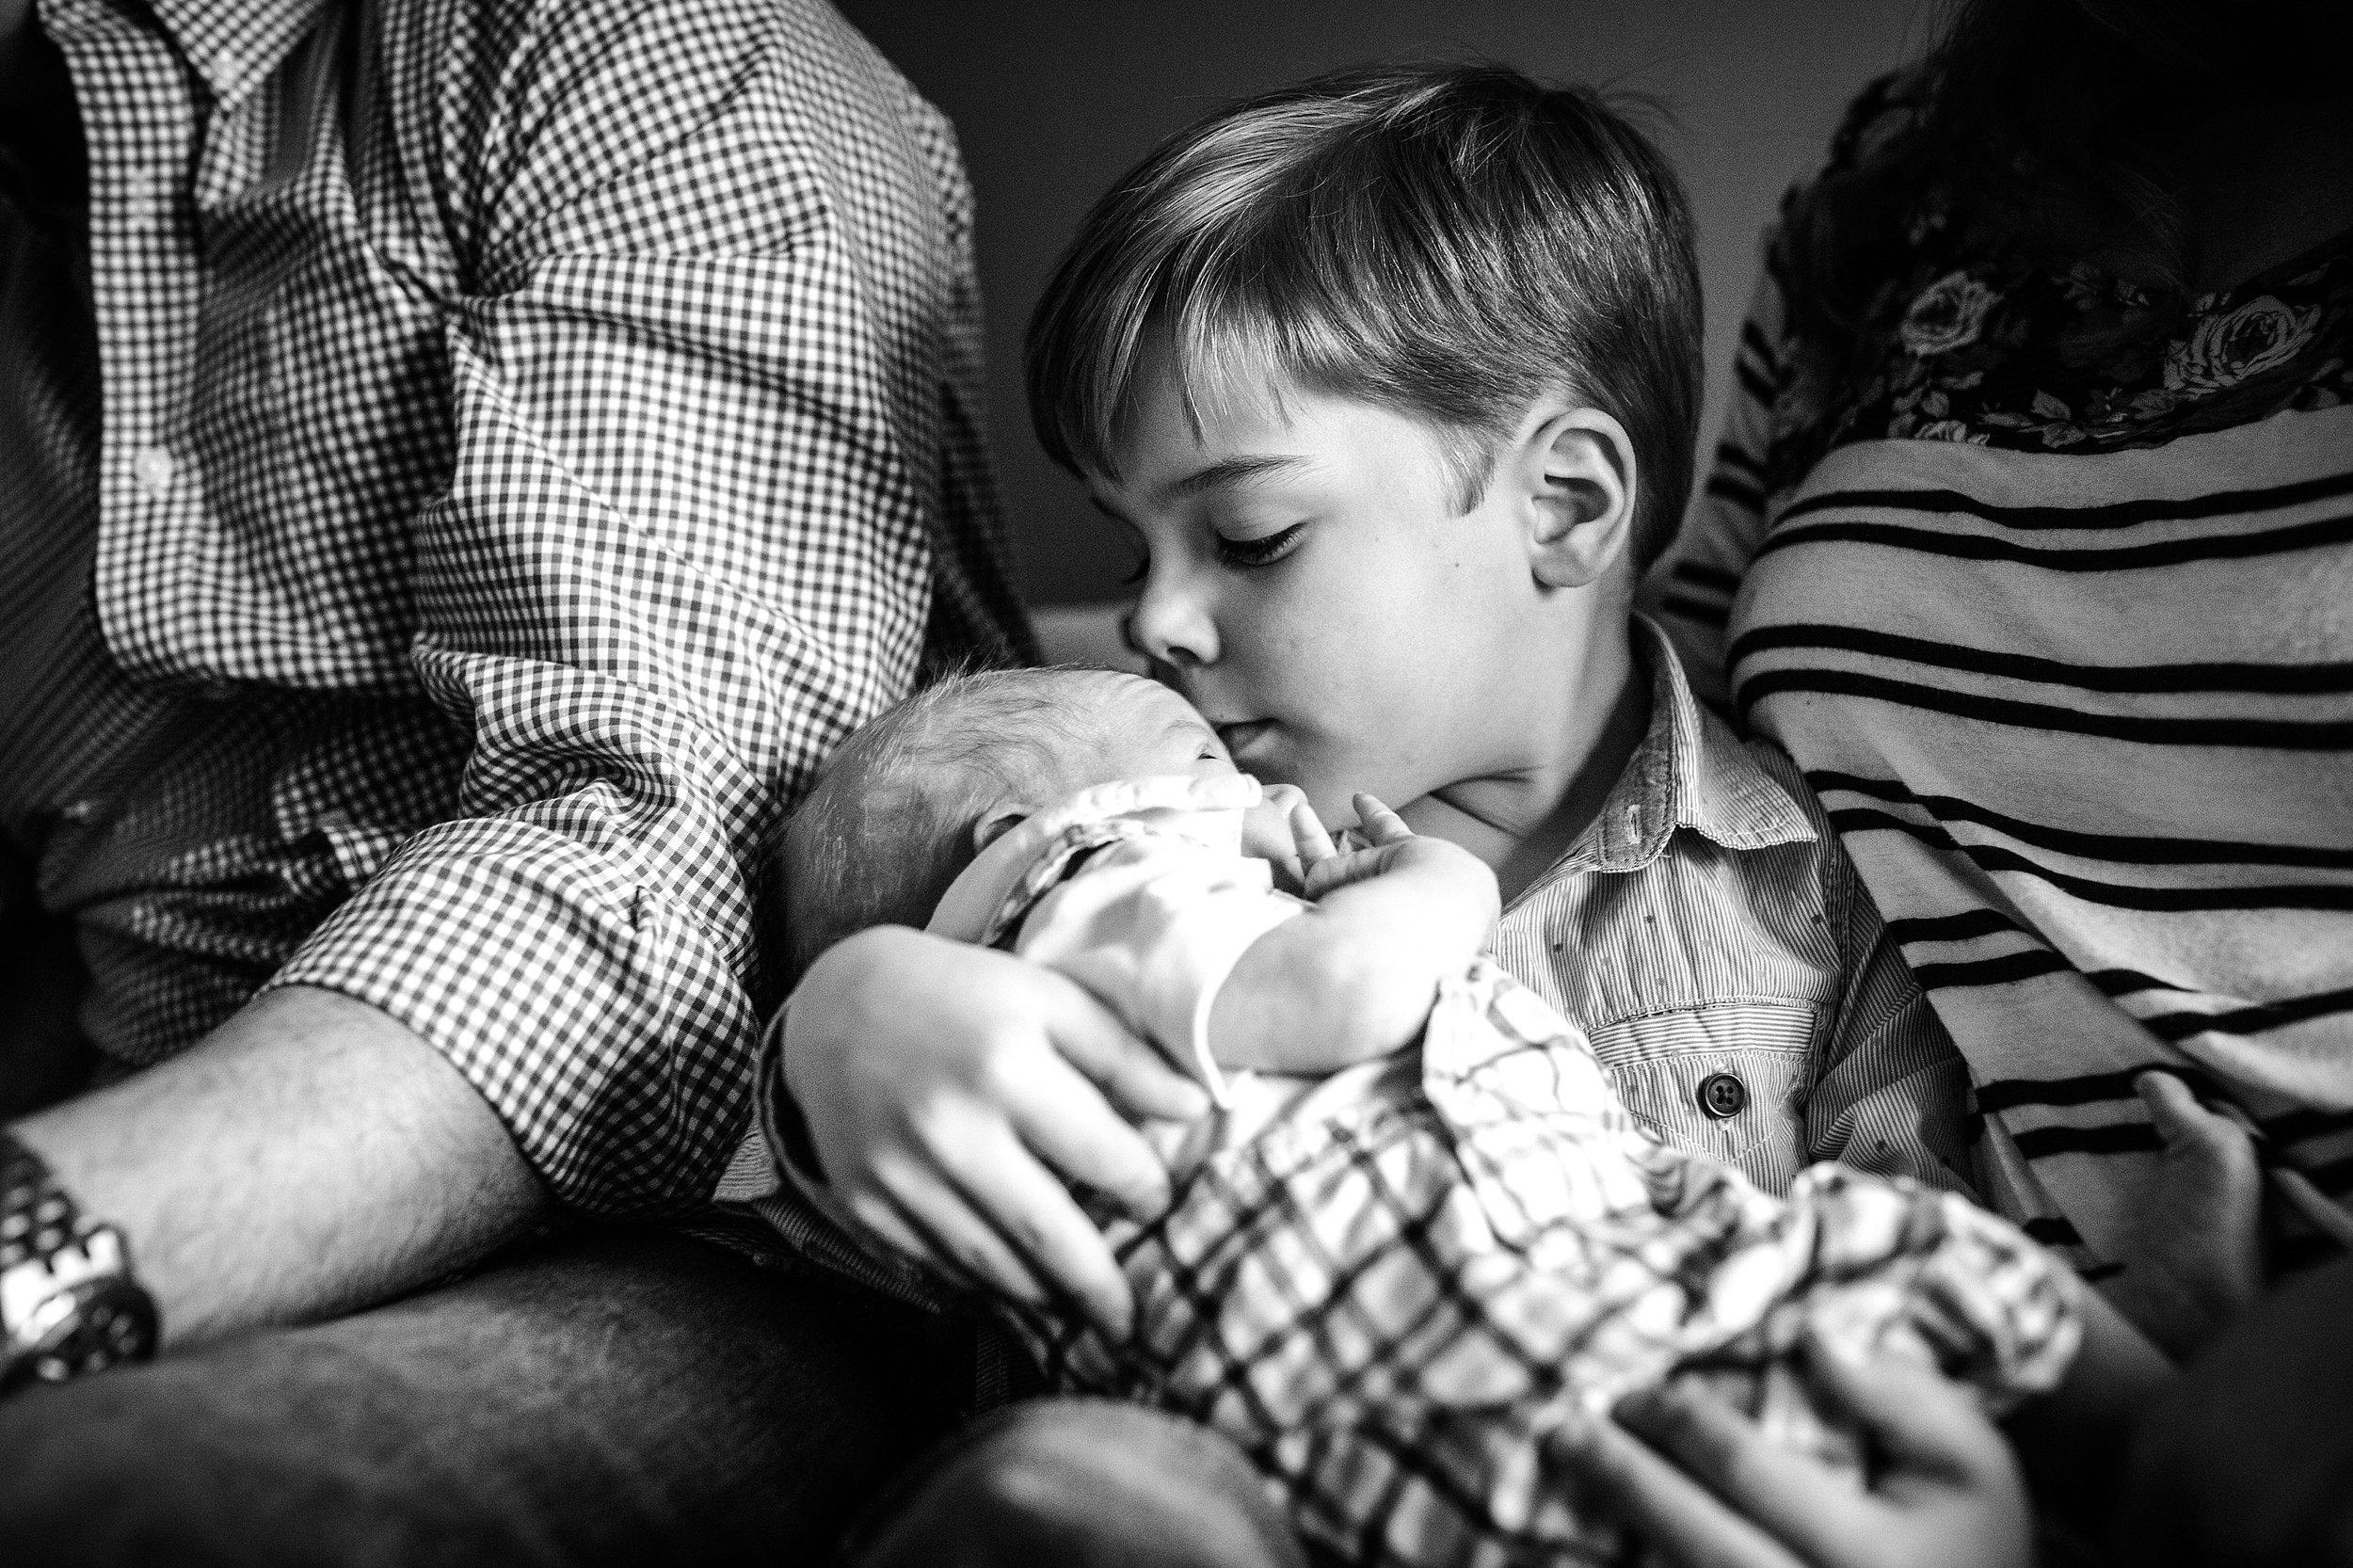 Lehigh-Valley-Newborn-Photographer_0015.jpg